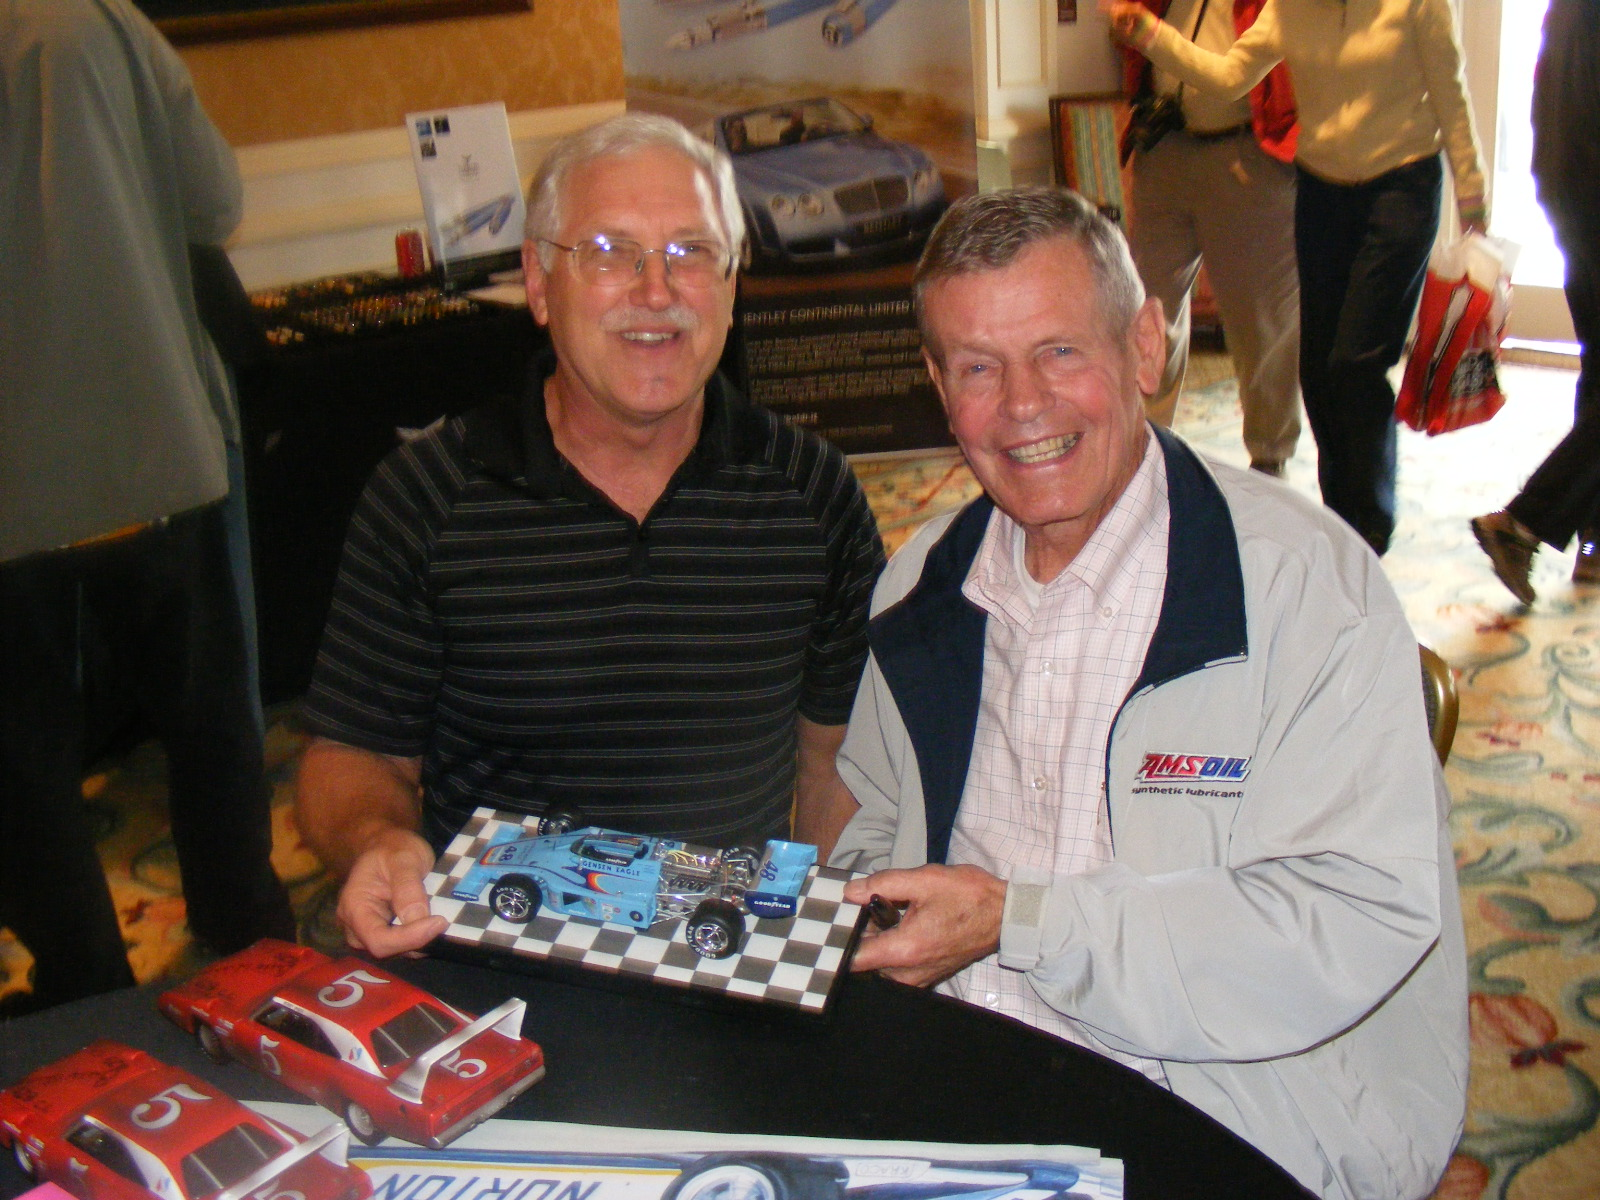 Bobby Unser signing models